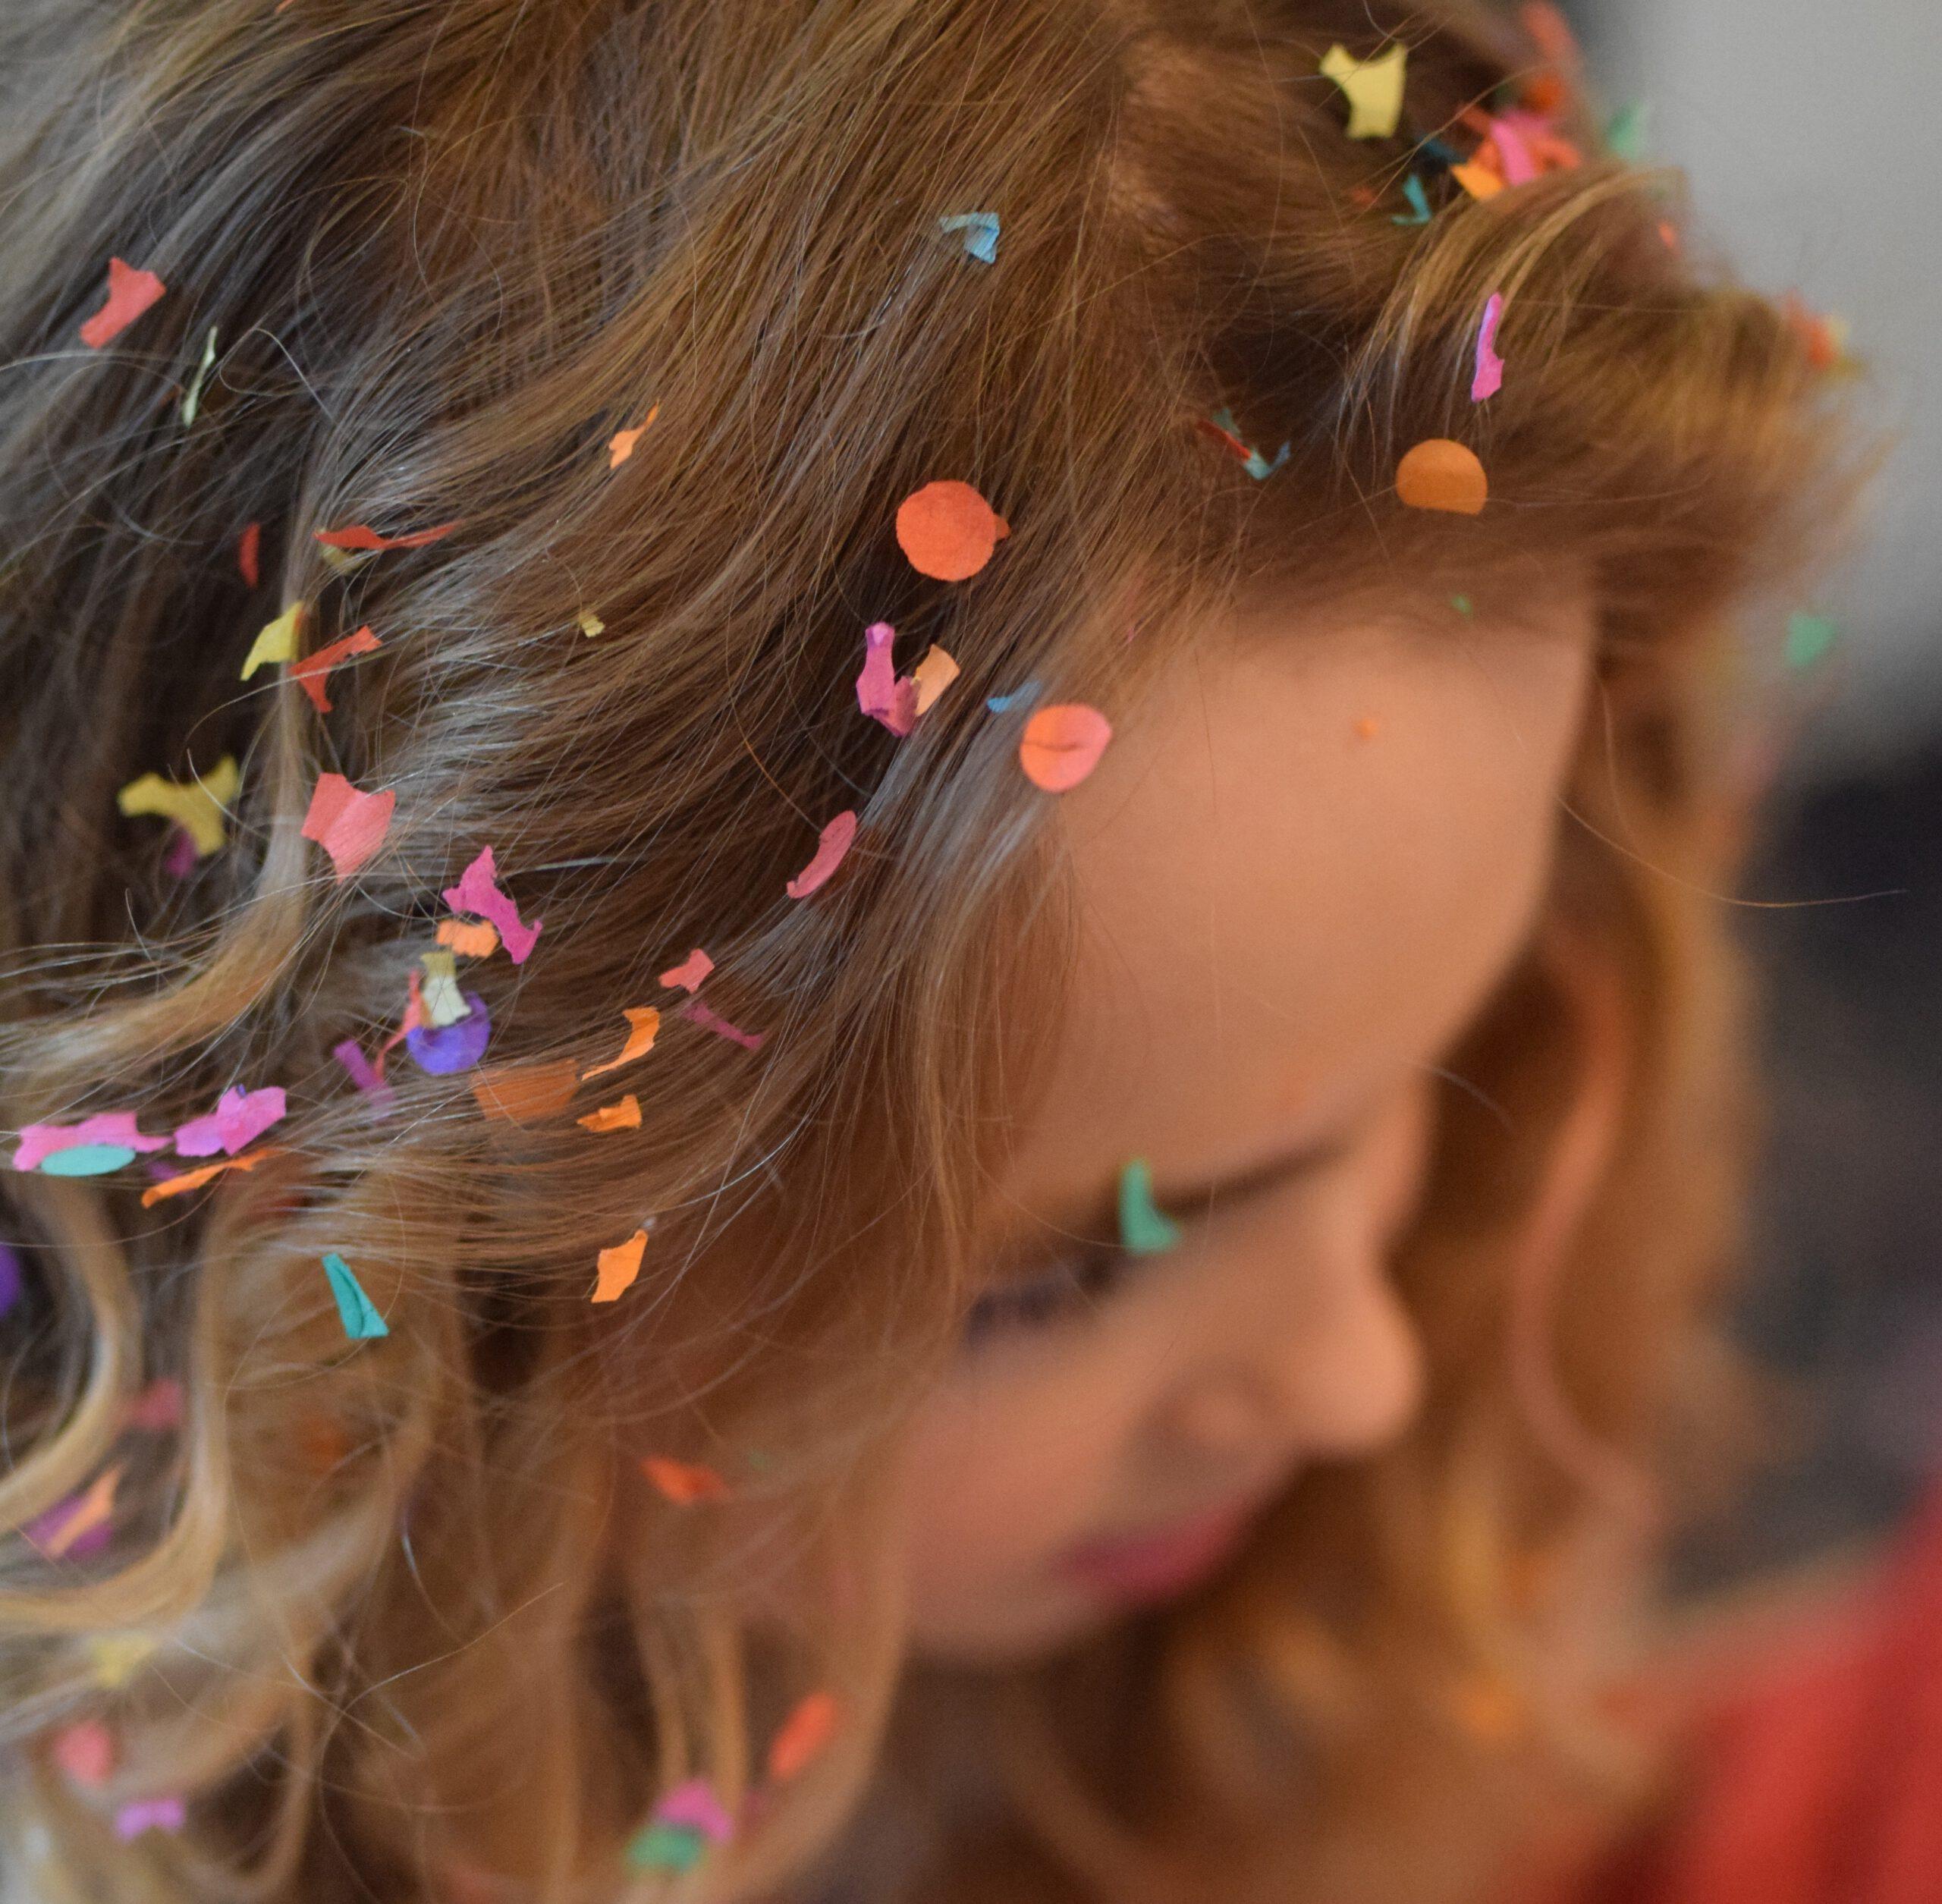 meisje met confetti in het haar